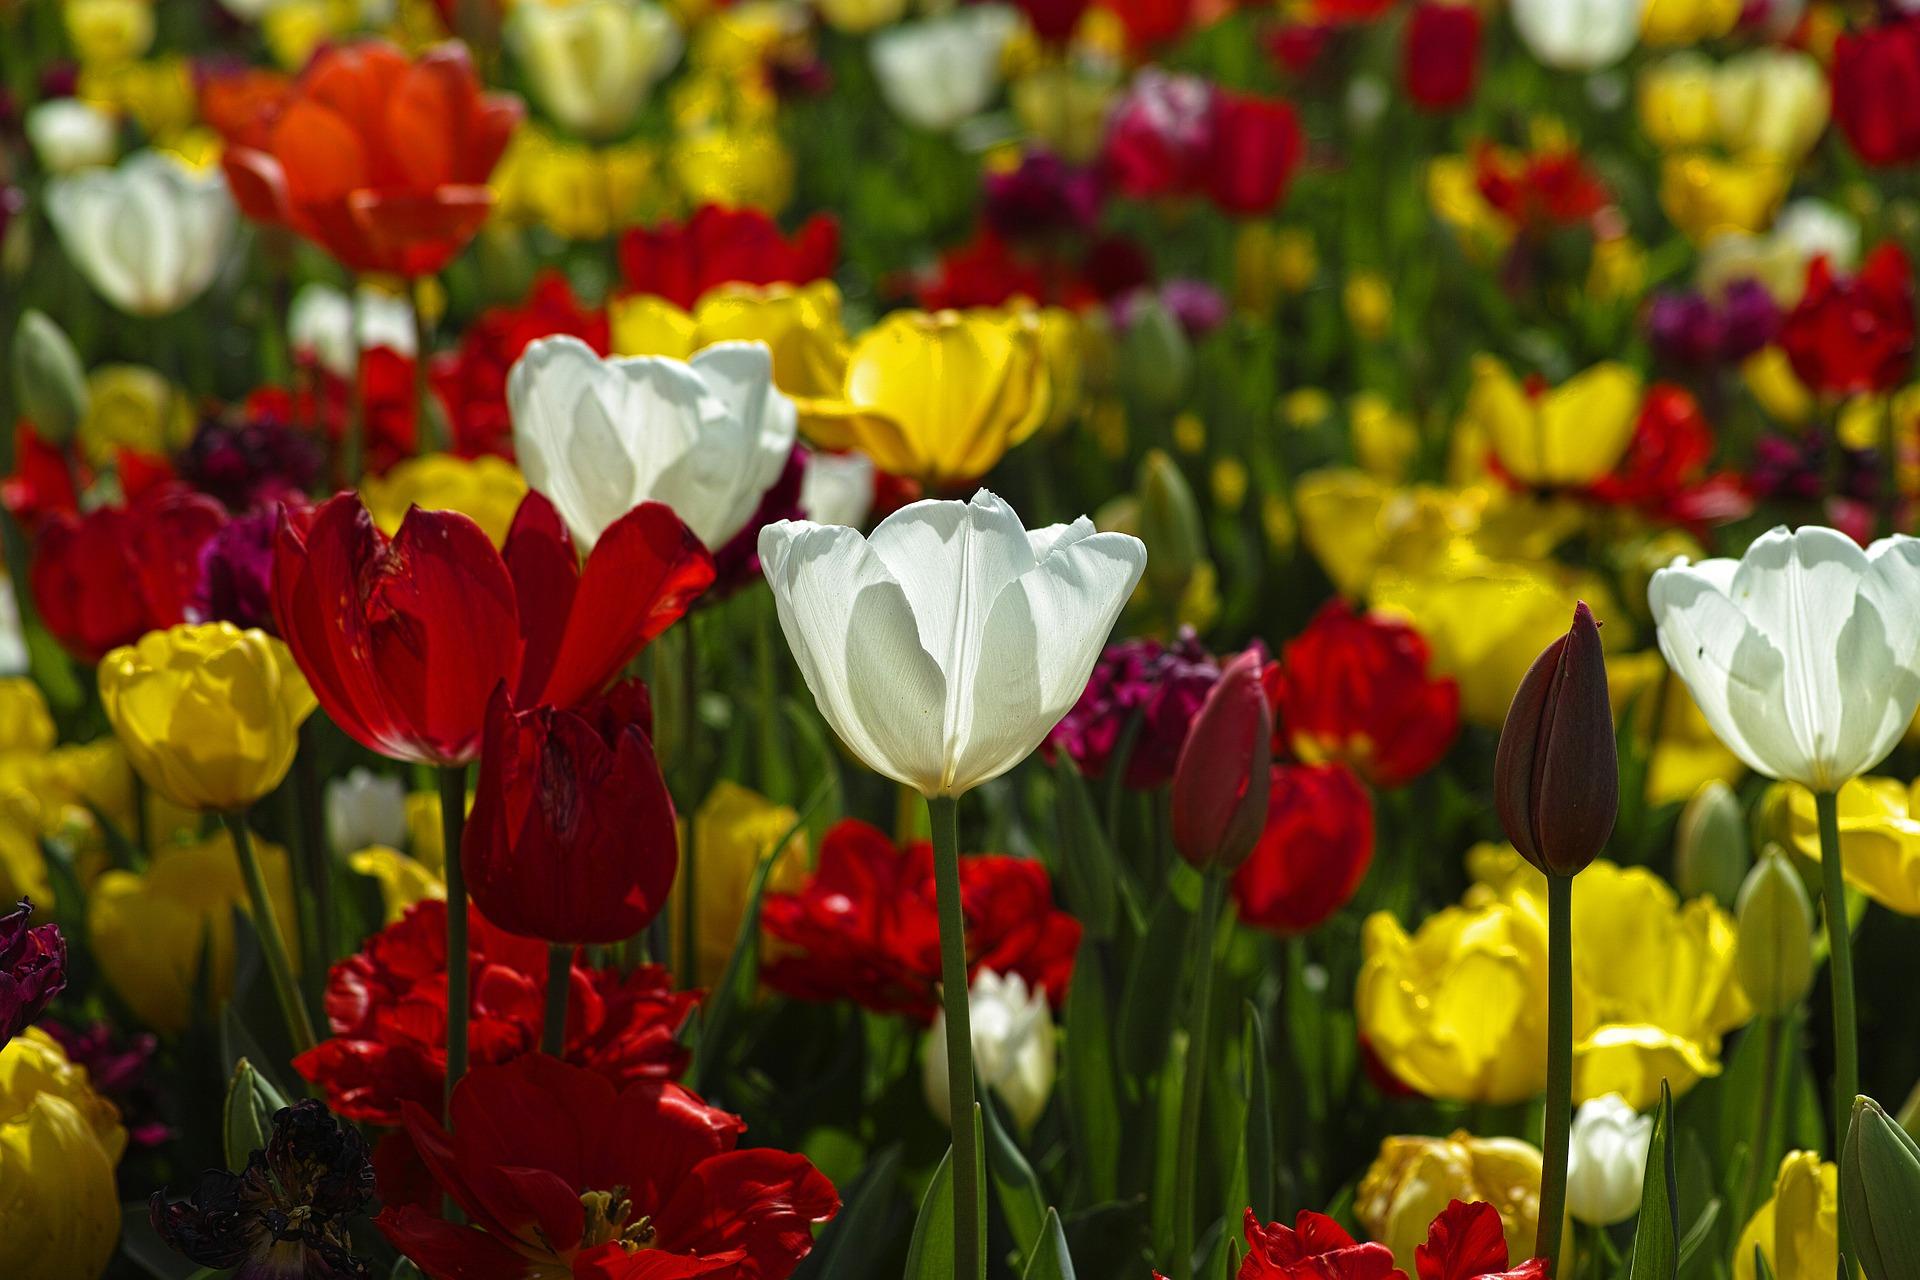 tulips-1511854_1920